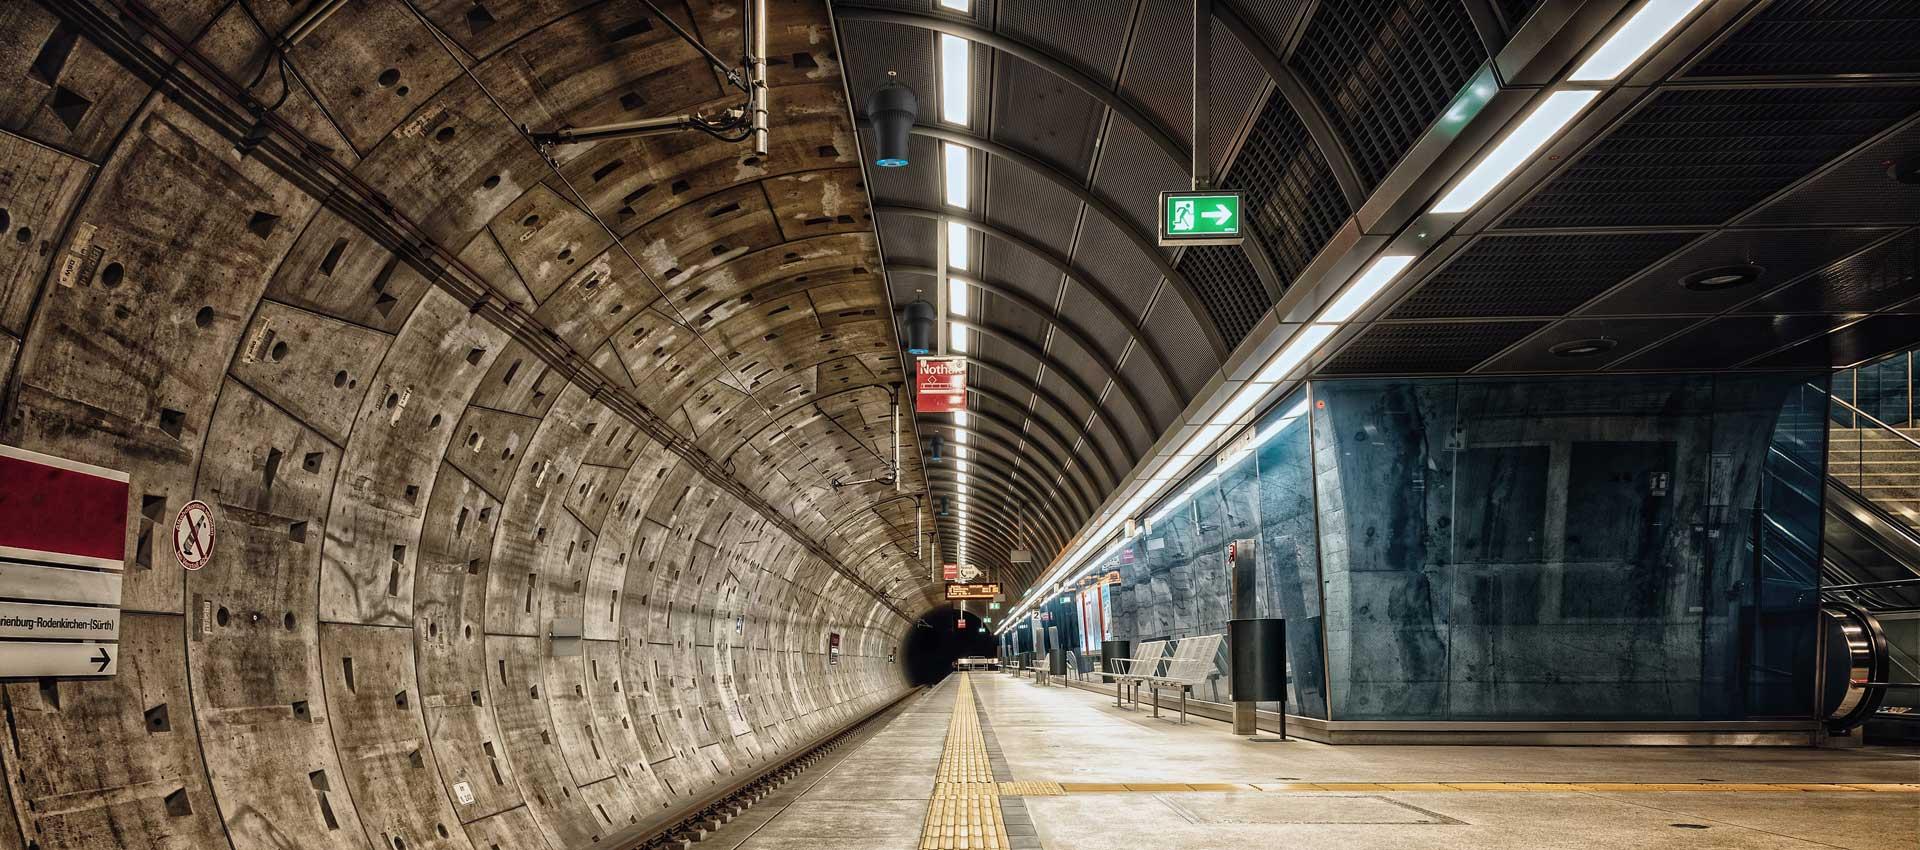 Airius PureAir PHI Air Purification System Installed In Subway Underground